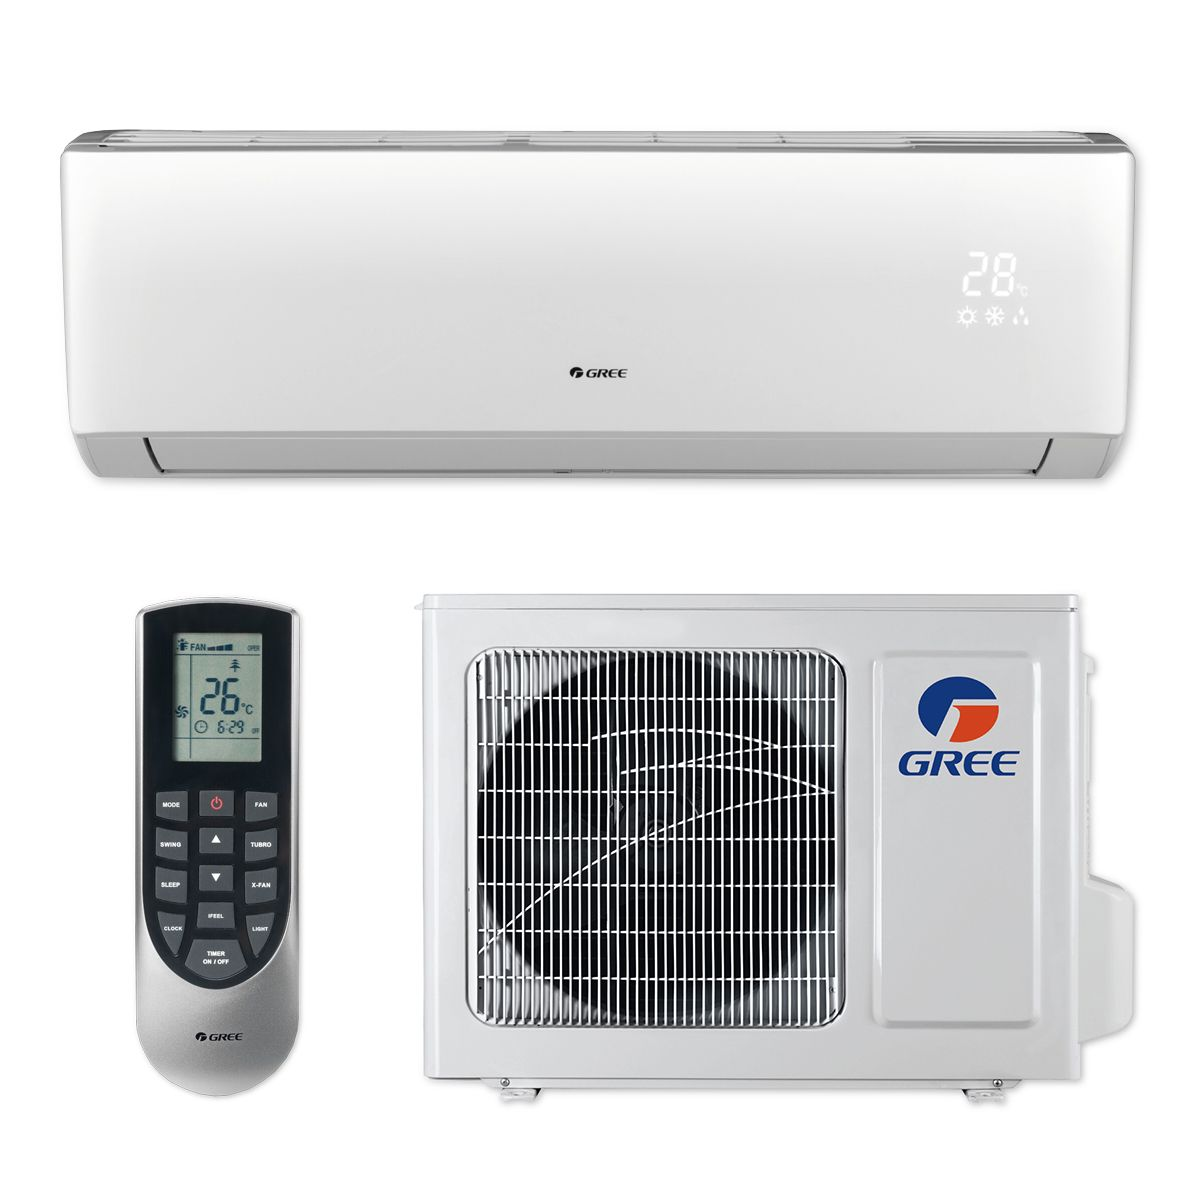 Gree VIR09HP115V1B - 9,000 BTU 23 SEER VIREO+ Wall Mount Ductless Mini Split Air Conditioner Heat Pump 115V